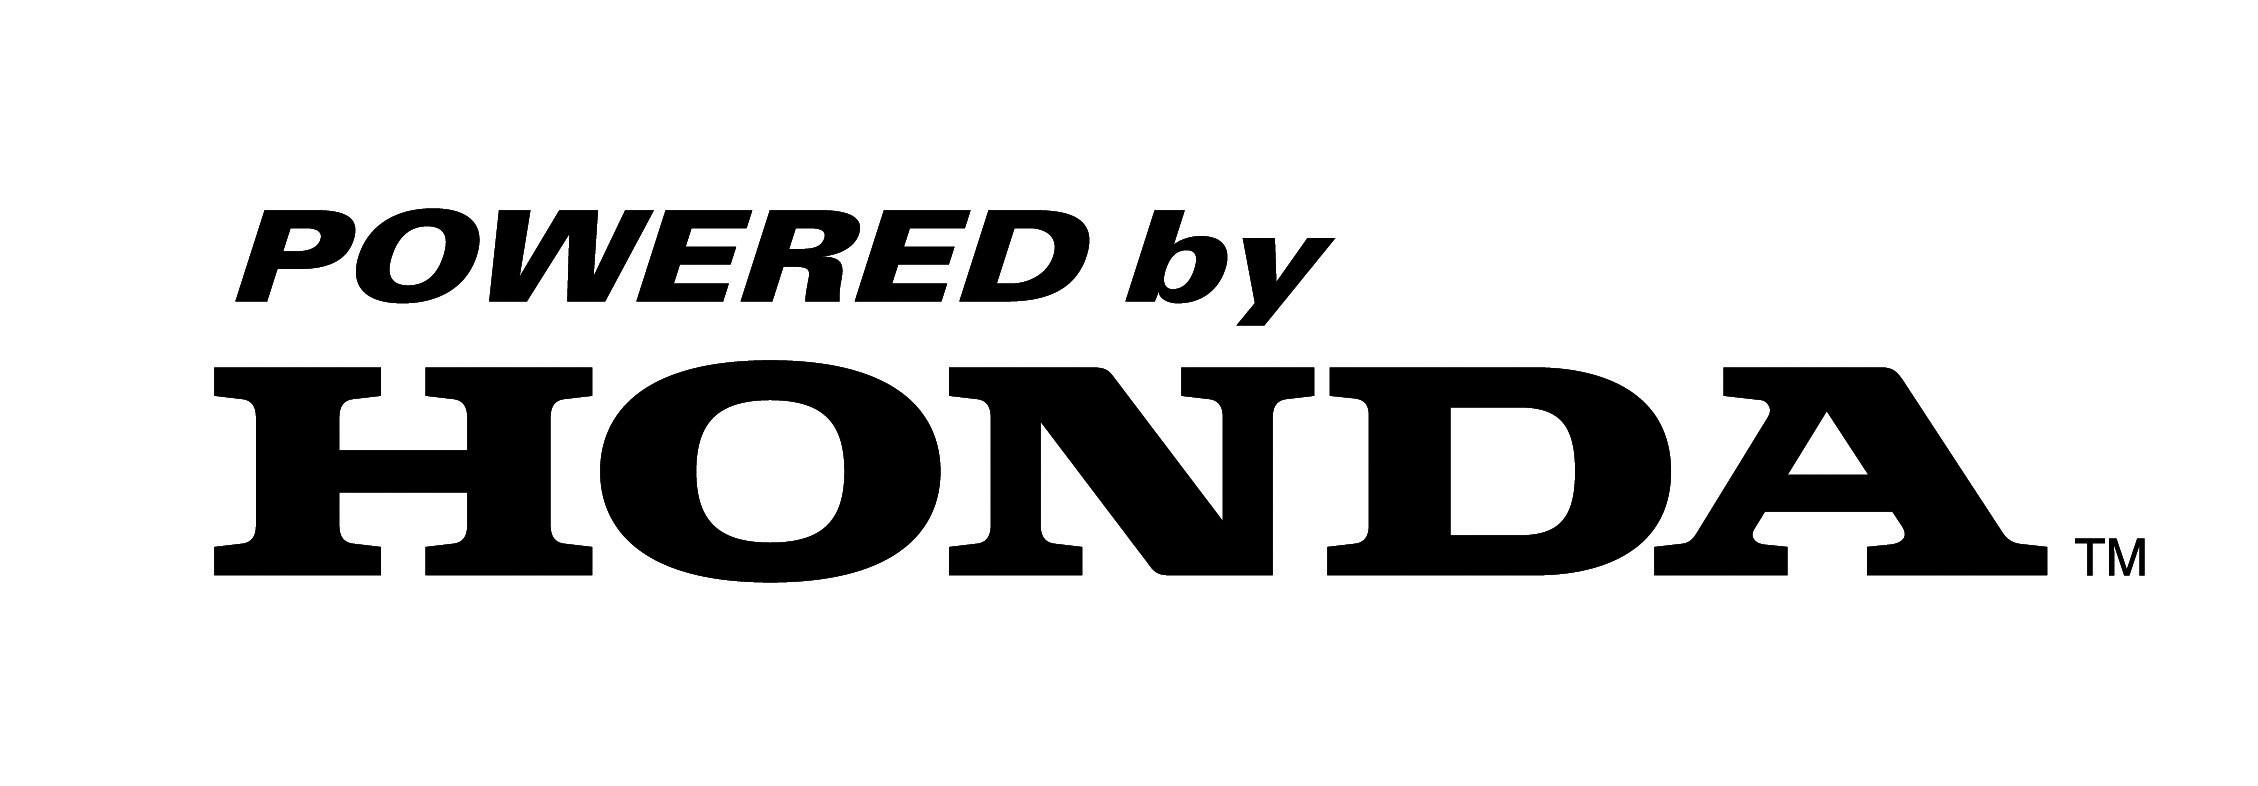 Logo Powered By Honda 2006